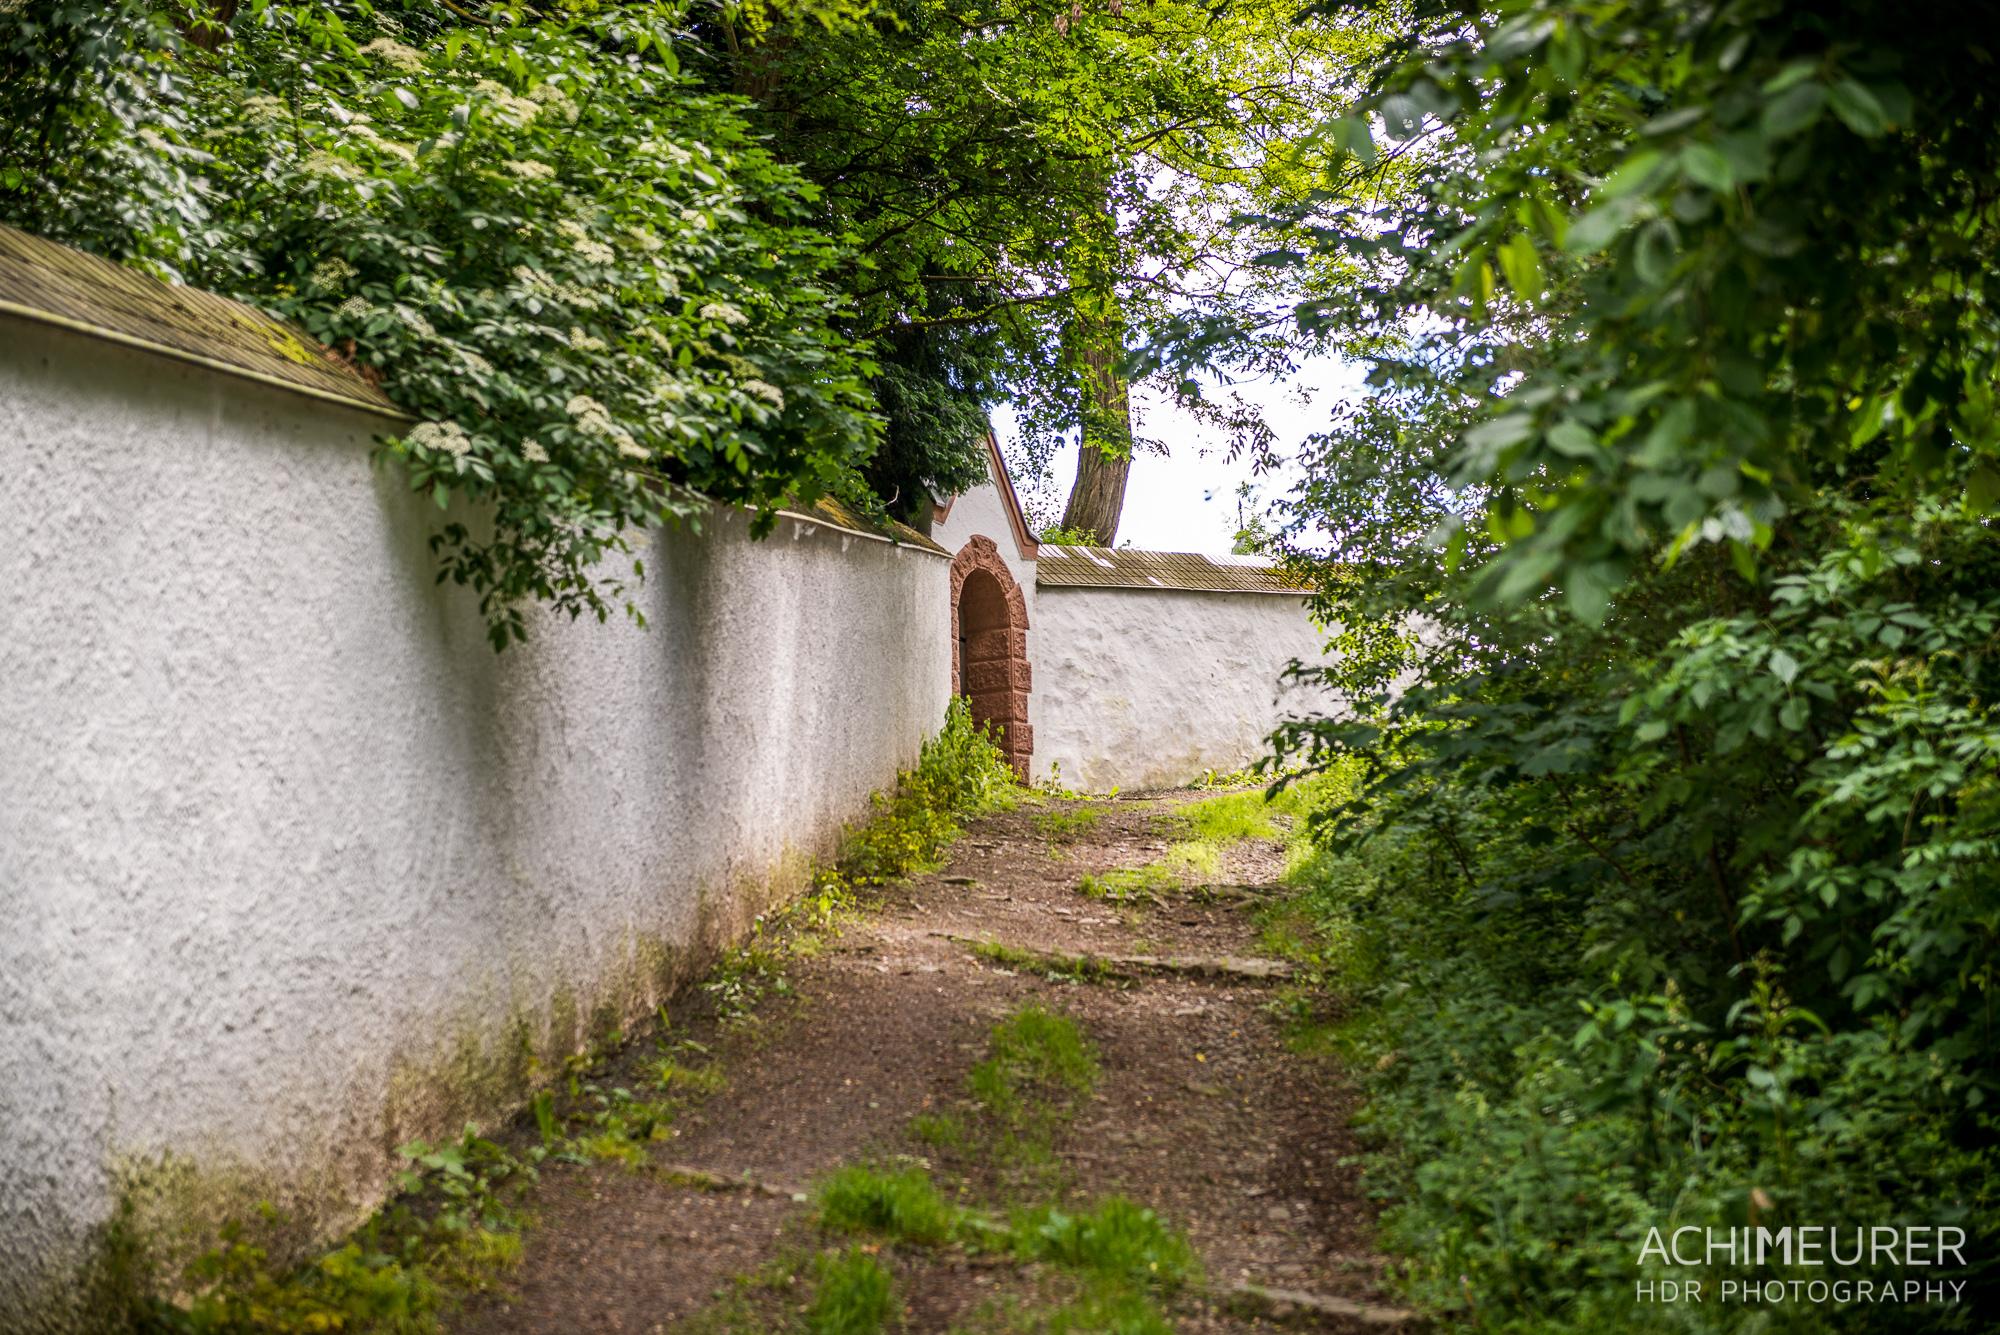 Eifel-Rheinland-Pfalz-Rureifel_5409